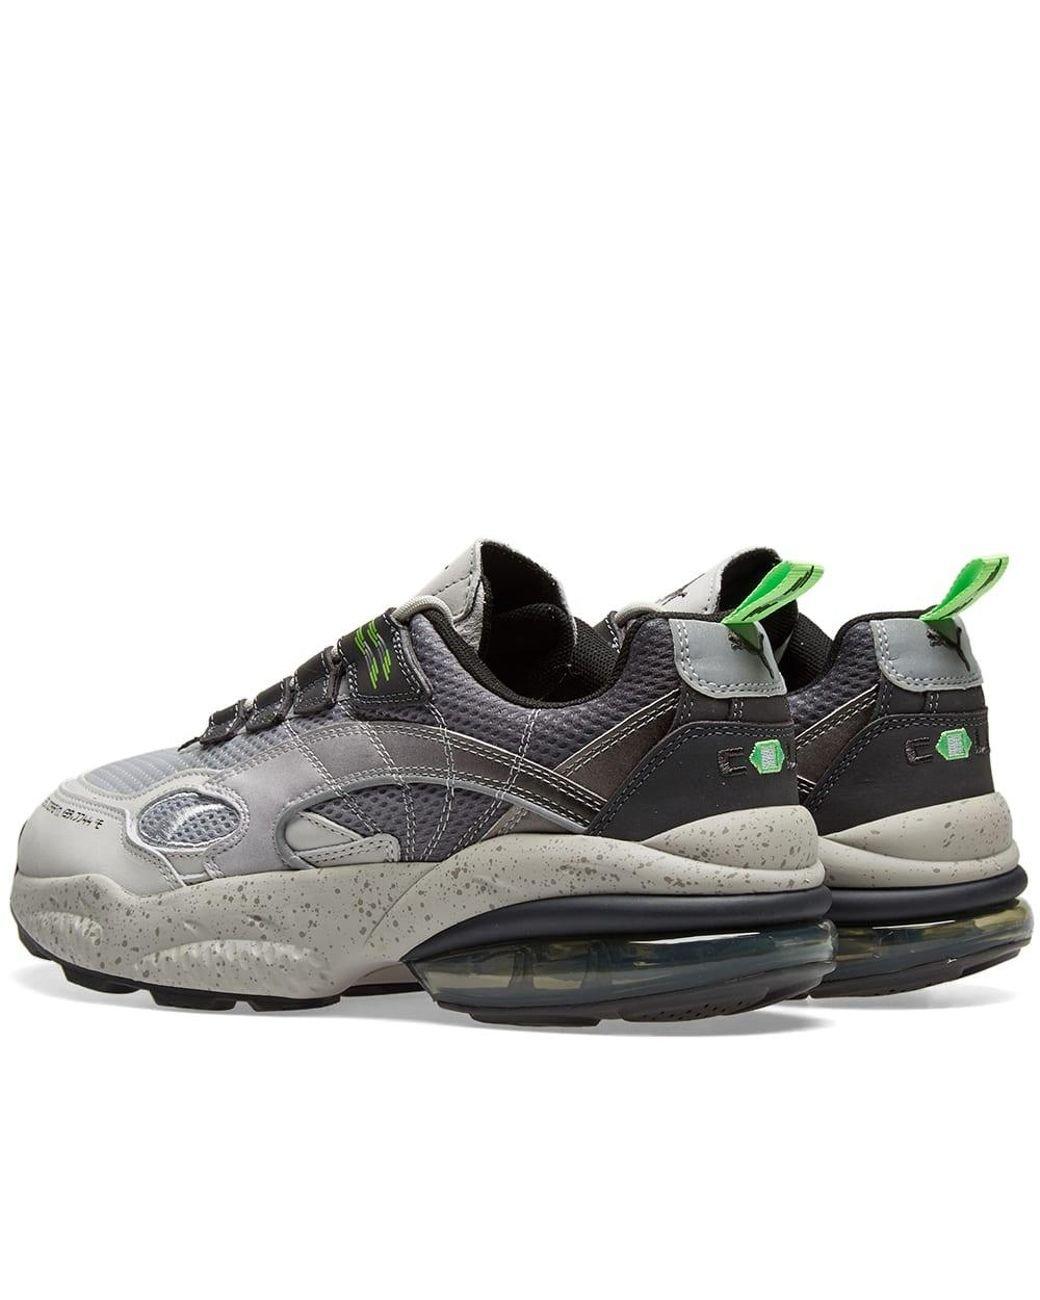 new product 30c59 0d52d Men's Gray X Mita Sneakers Cell Venom